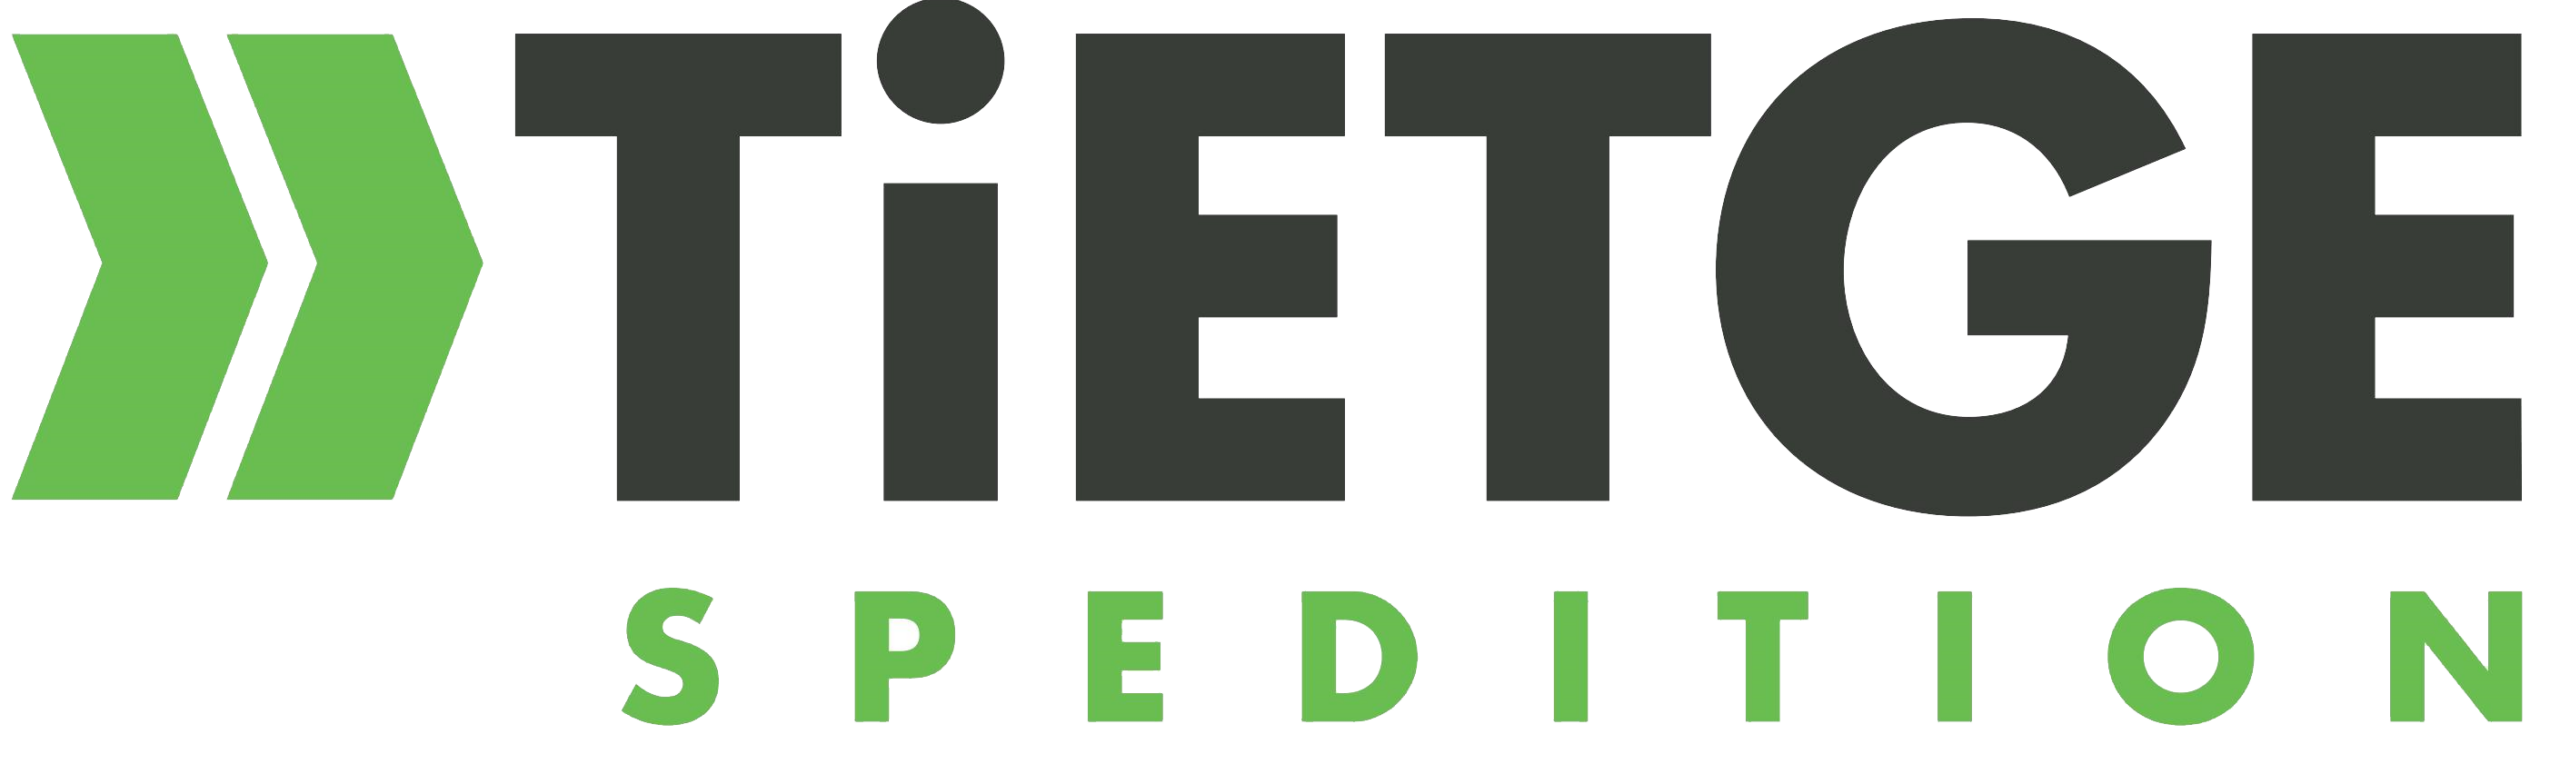 Spedition Tietge Logo